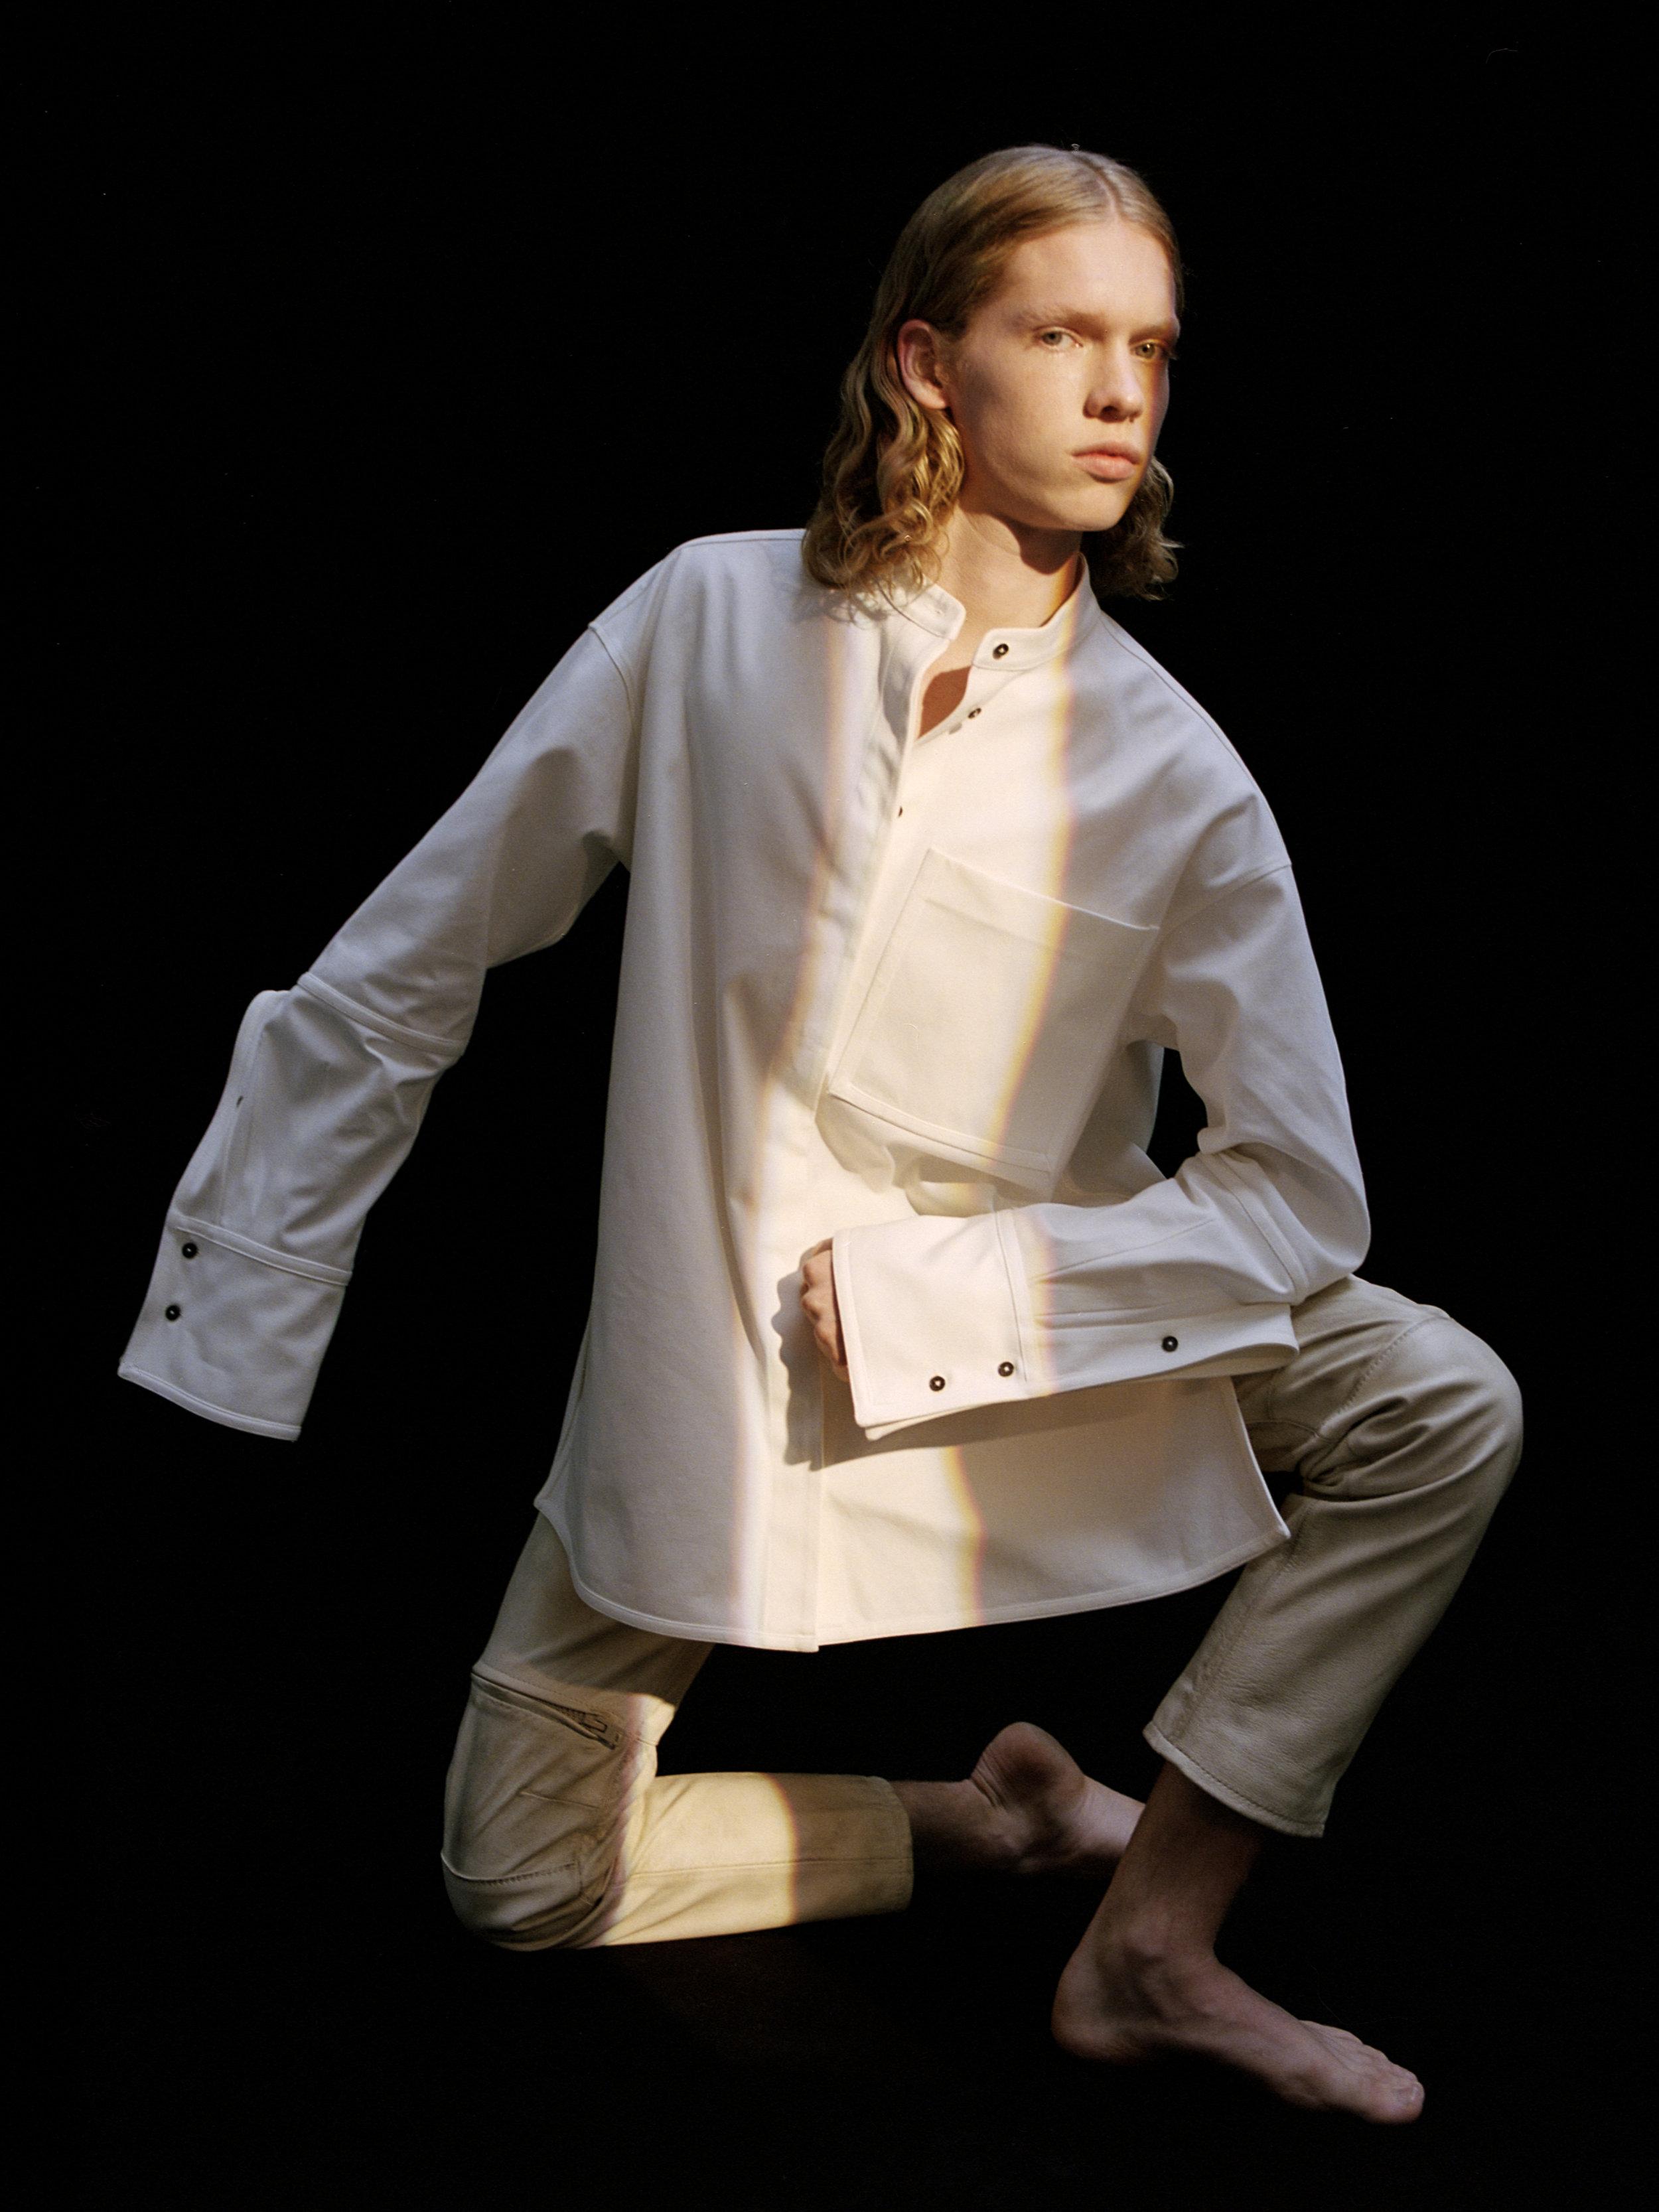 Shirt  JIL SANDER  Trousers  COACH 1941